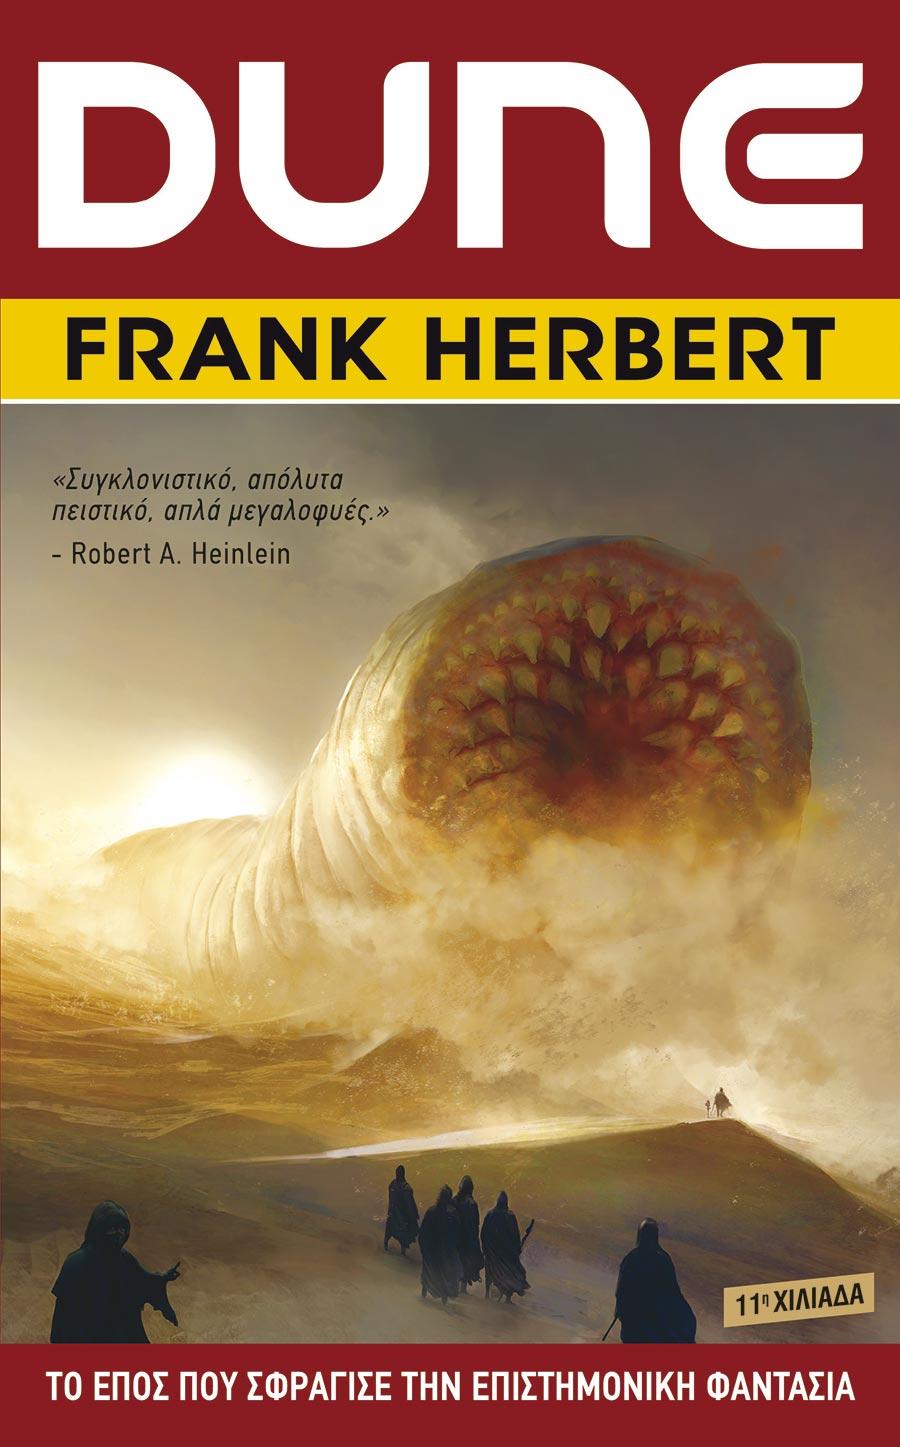 Dune, , Herbert, Frank, 1920-1986, Anubis, 2020